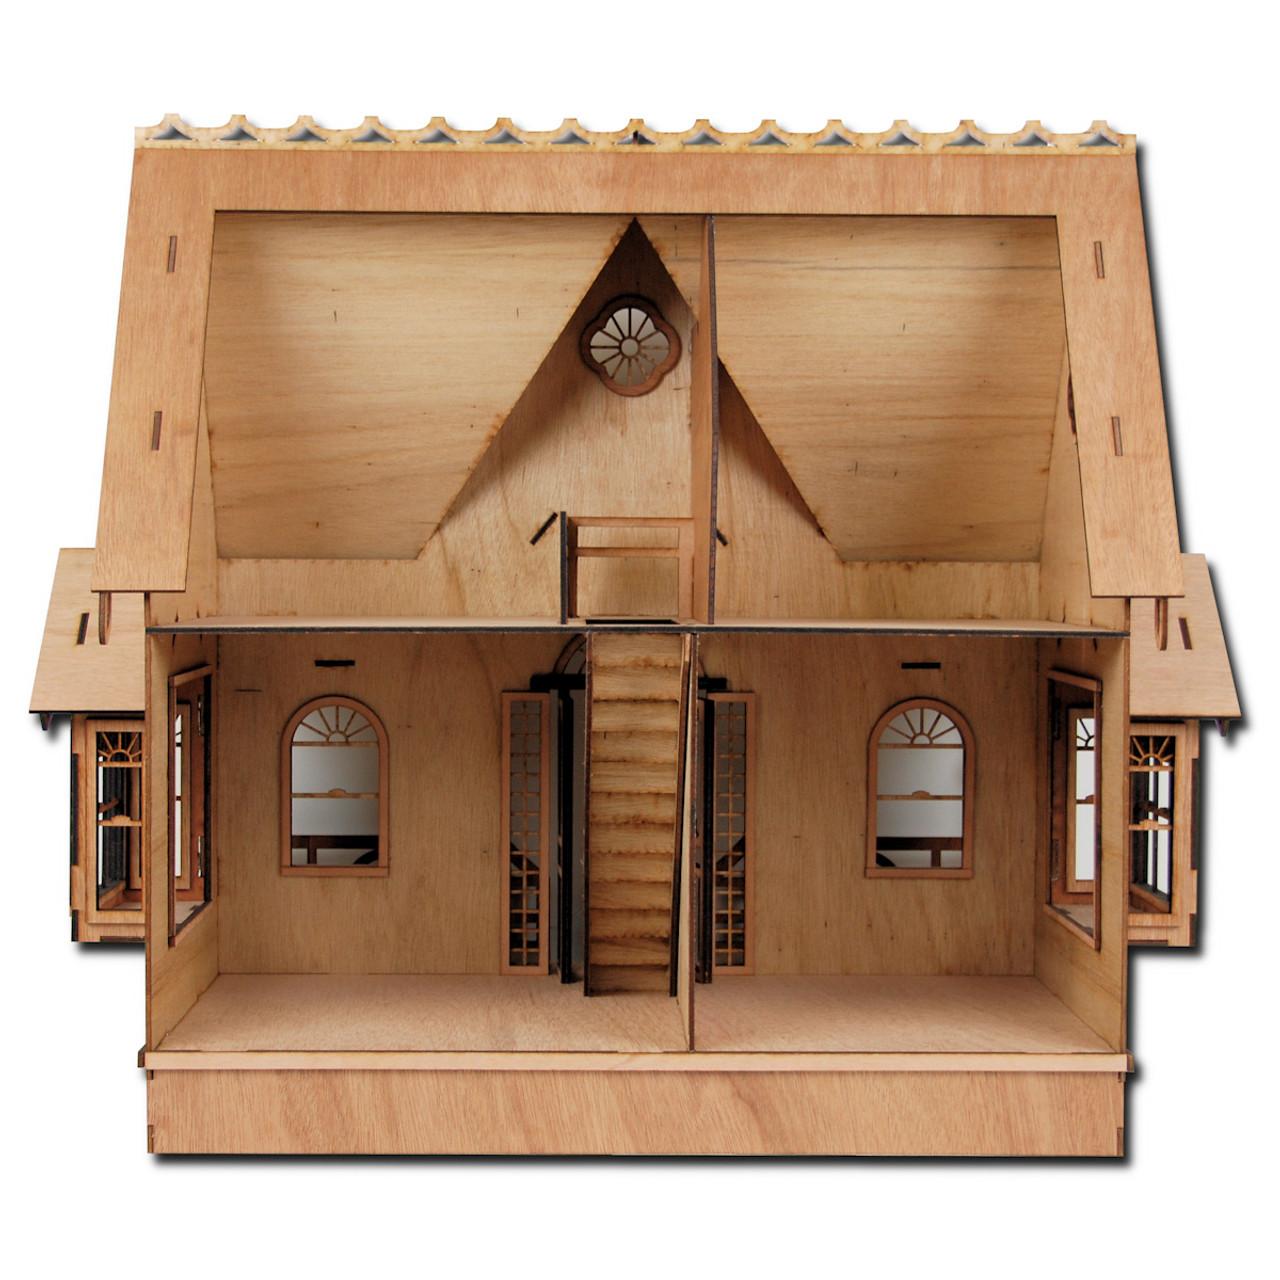 Laser Cut Diana Dollhouse Kit